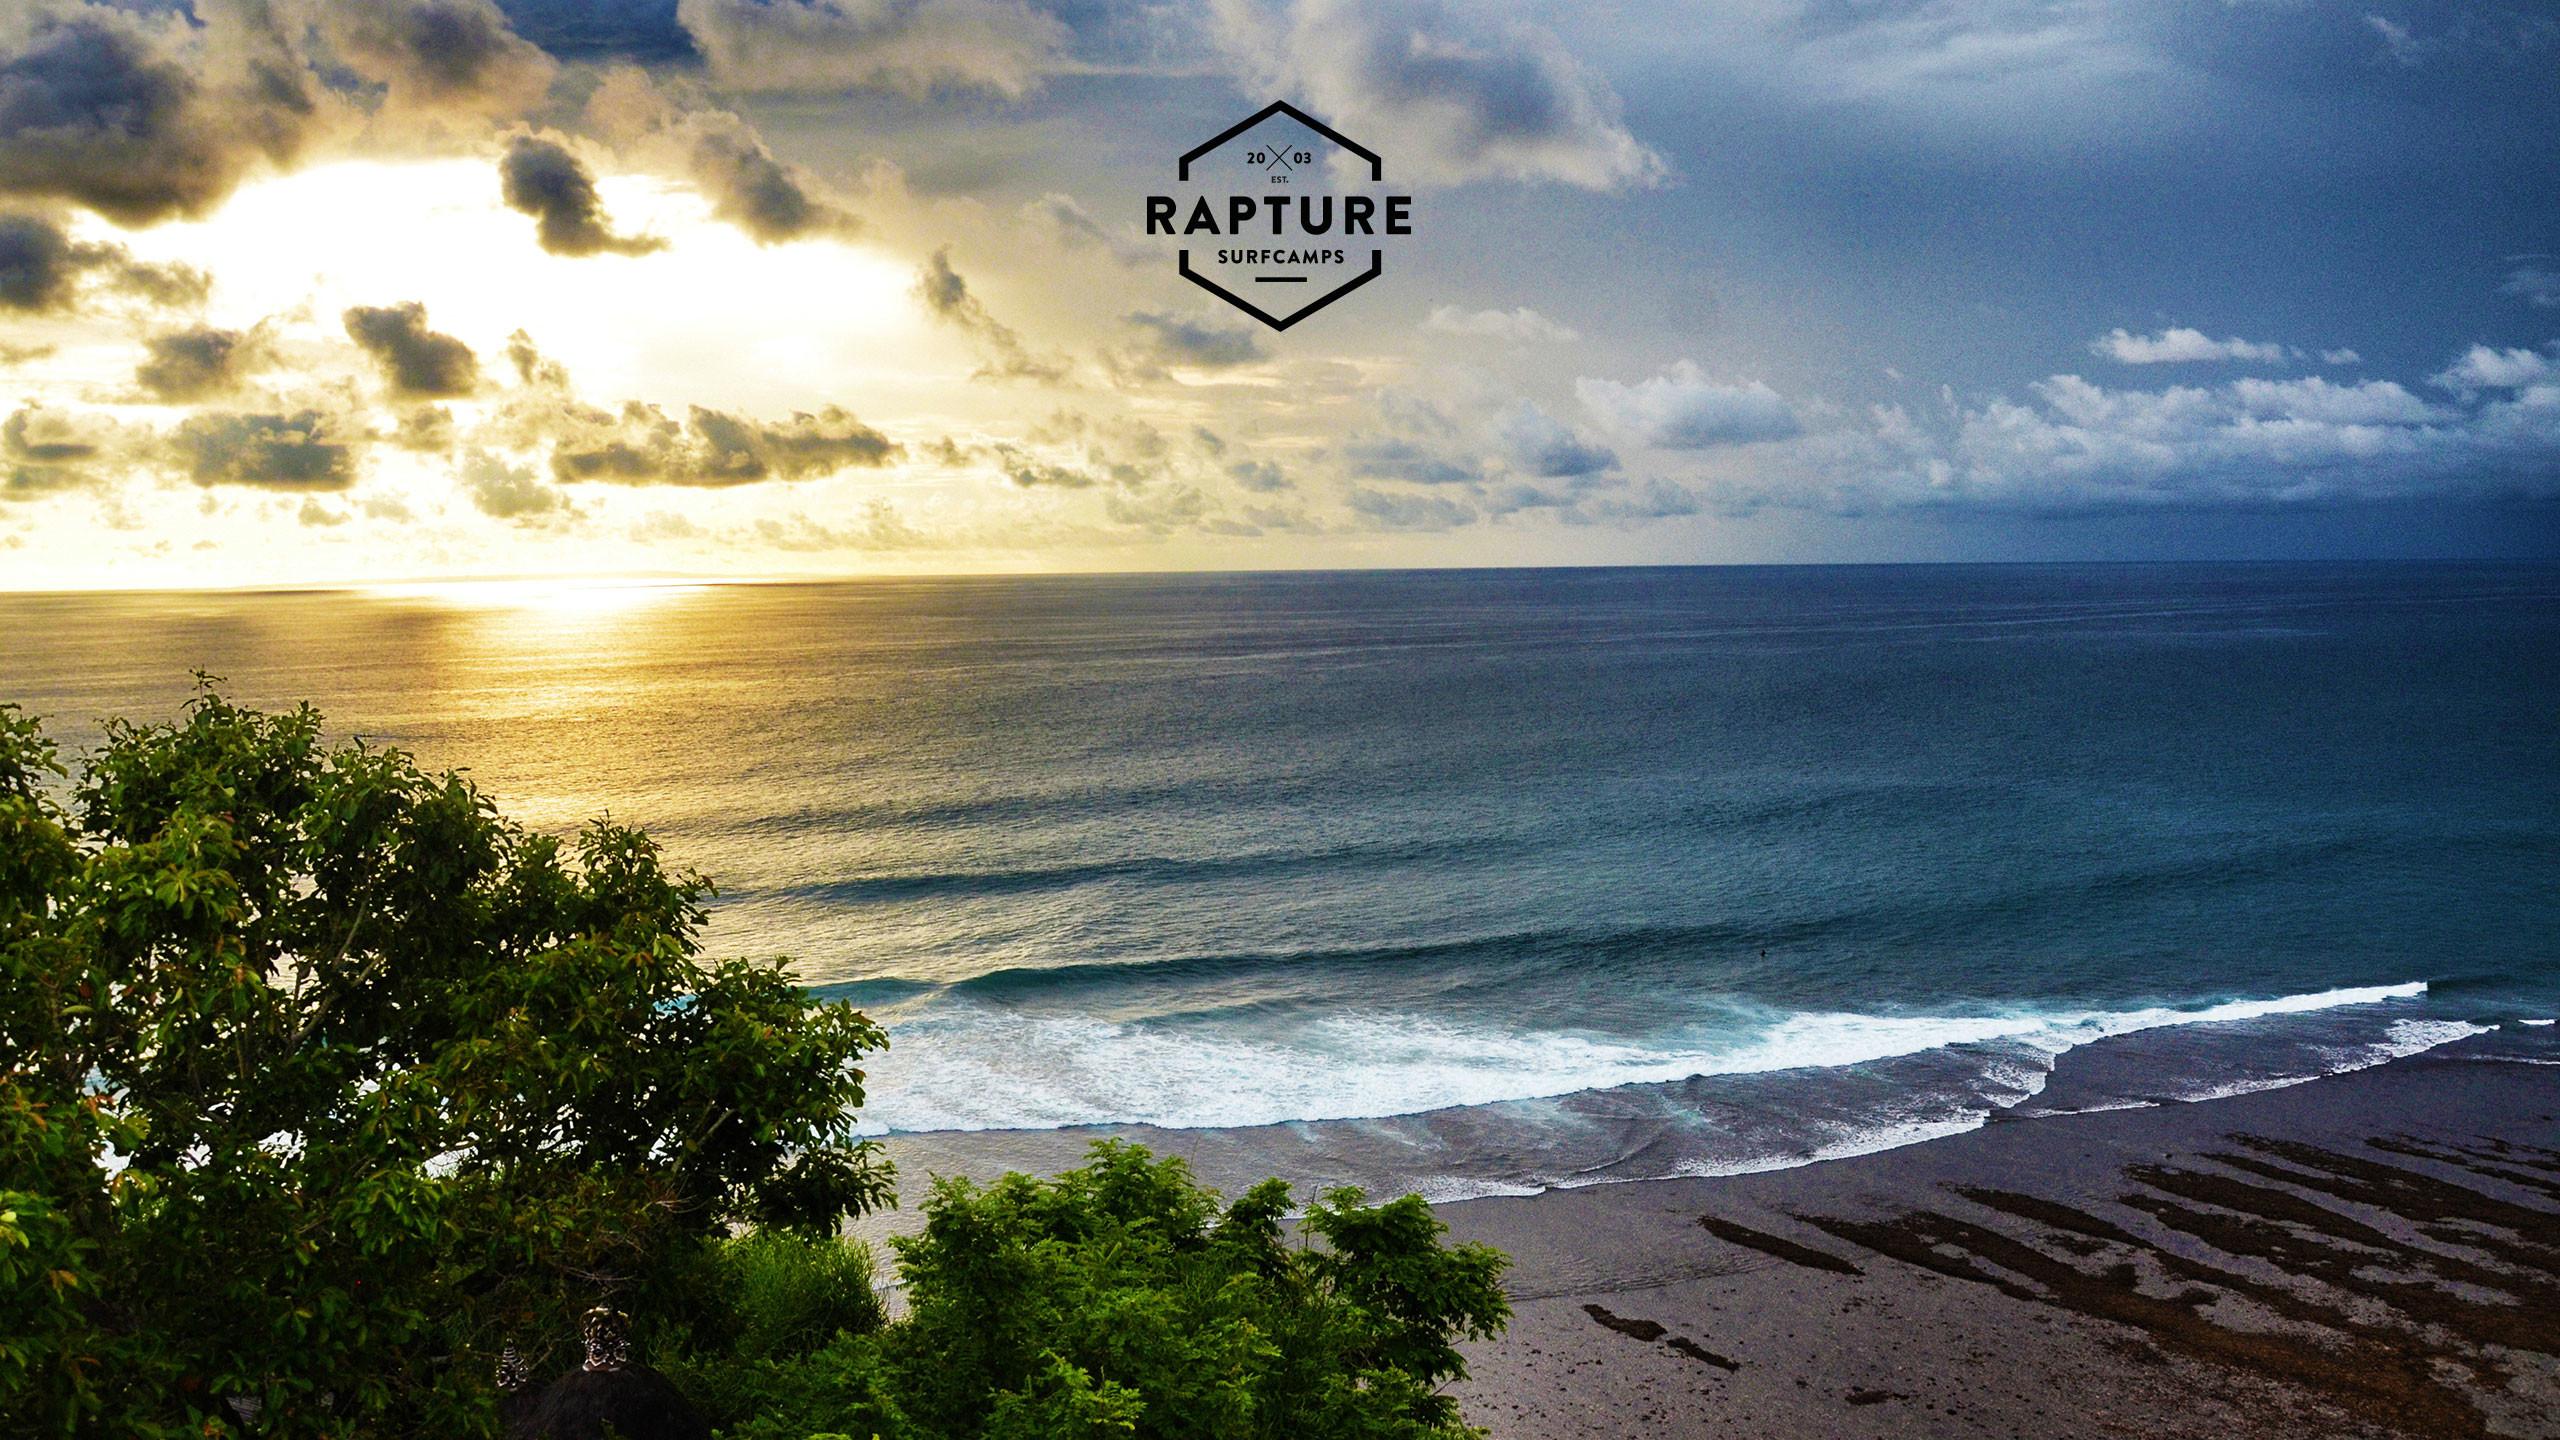 … surfcamp bali surfing wallpapers …